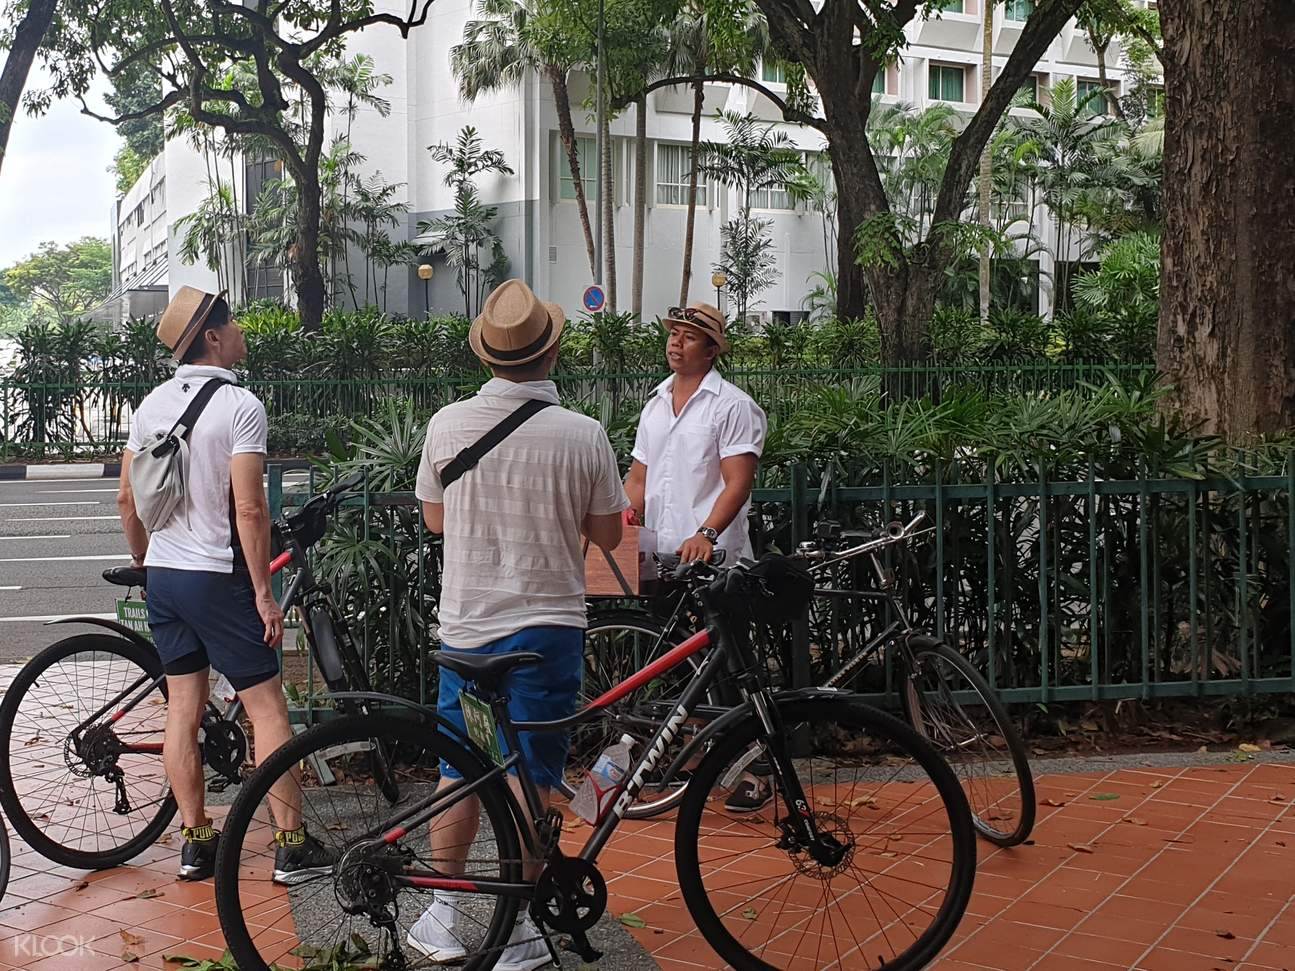 Biking tour with guide